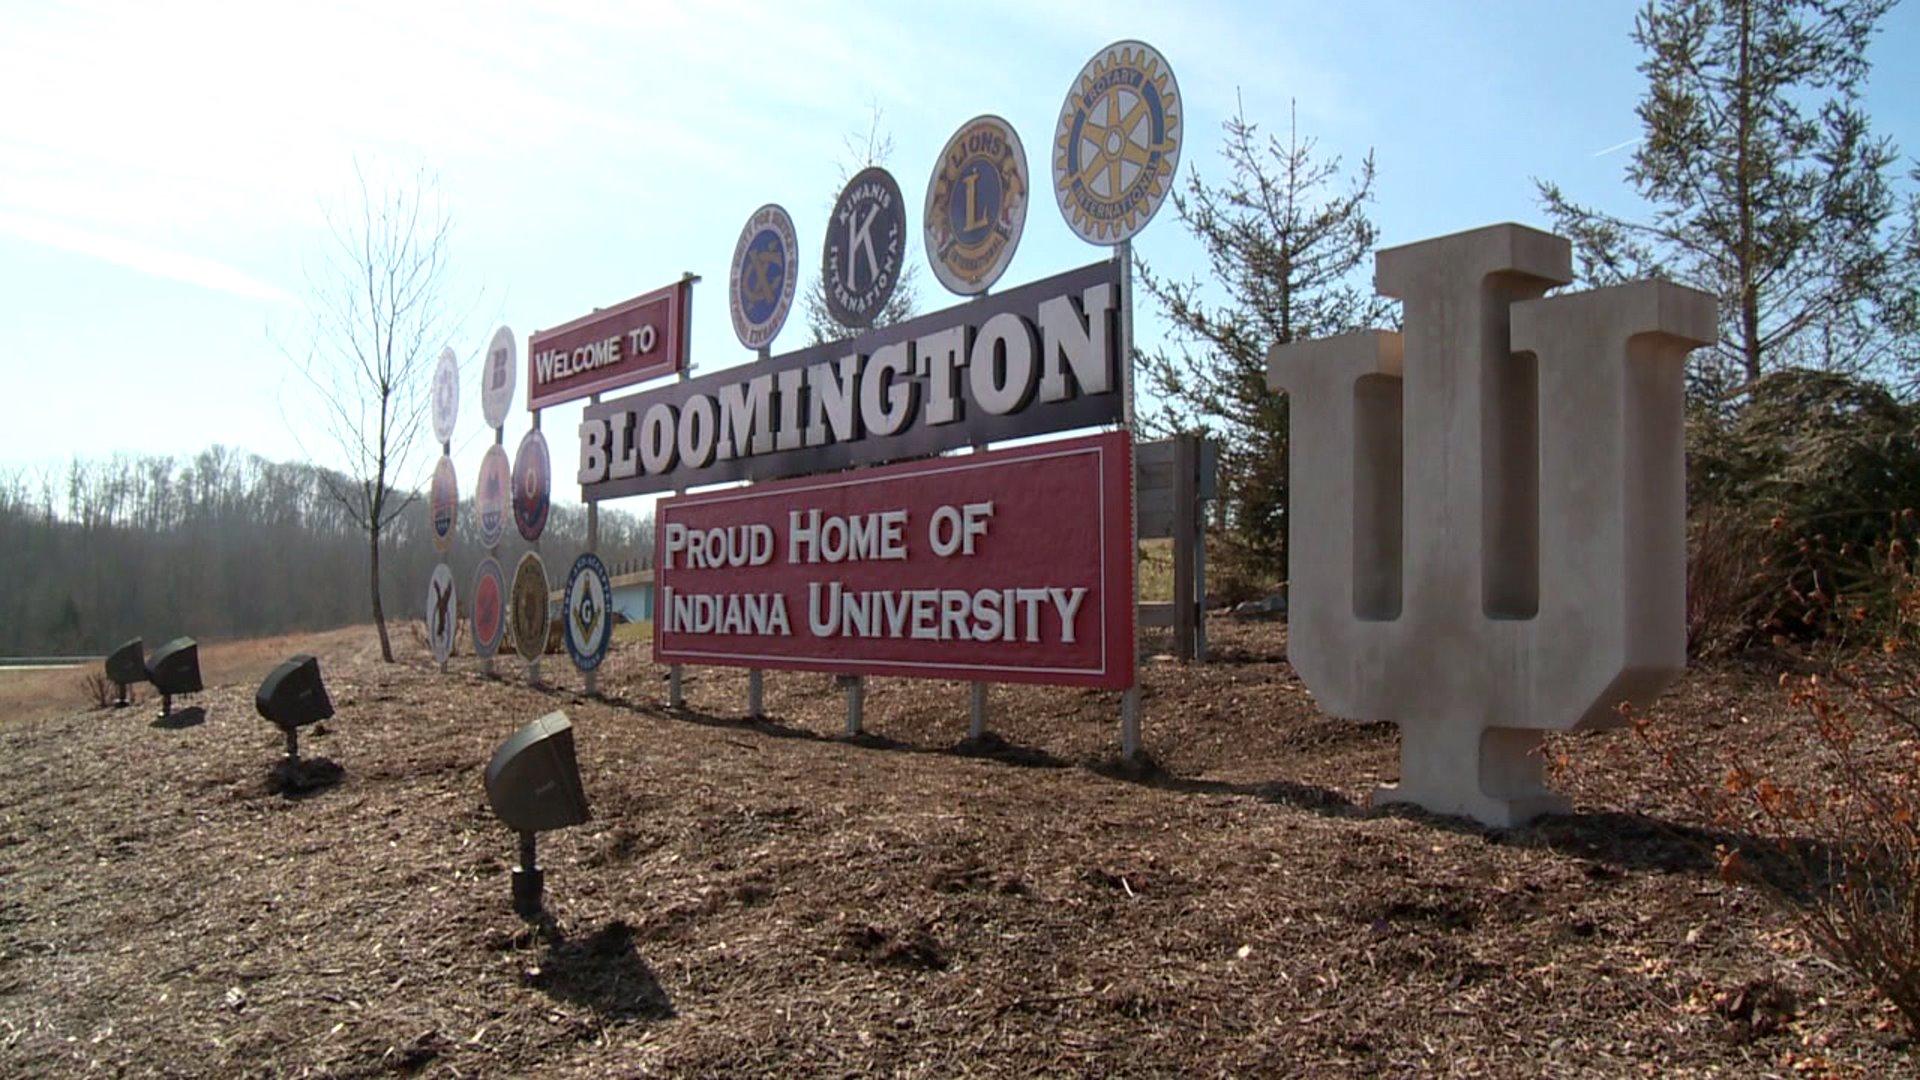 bloomington sign